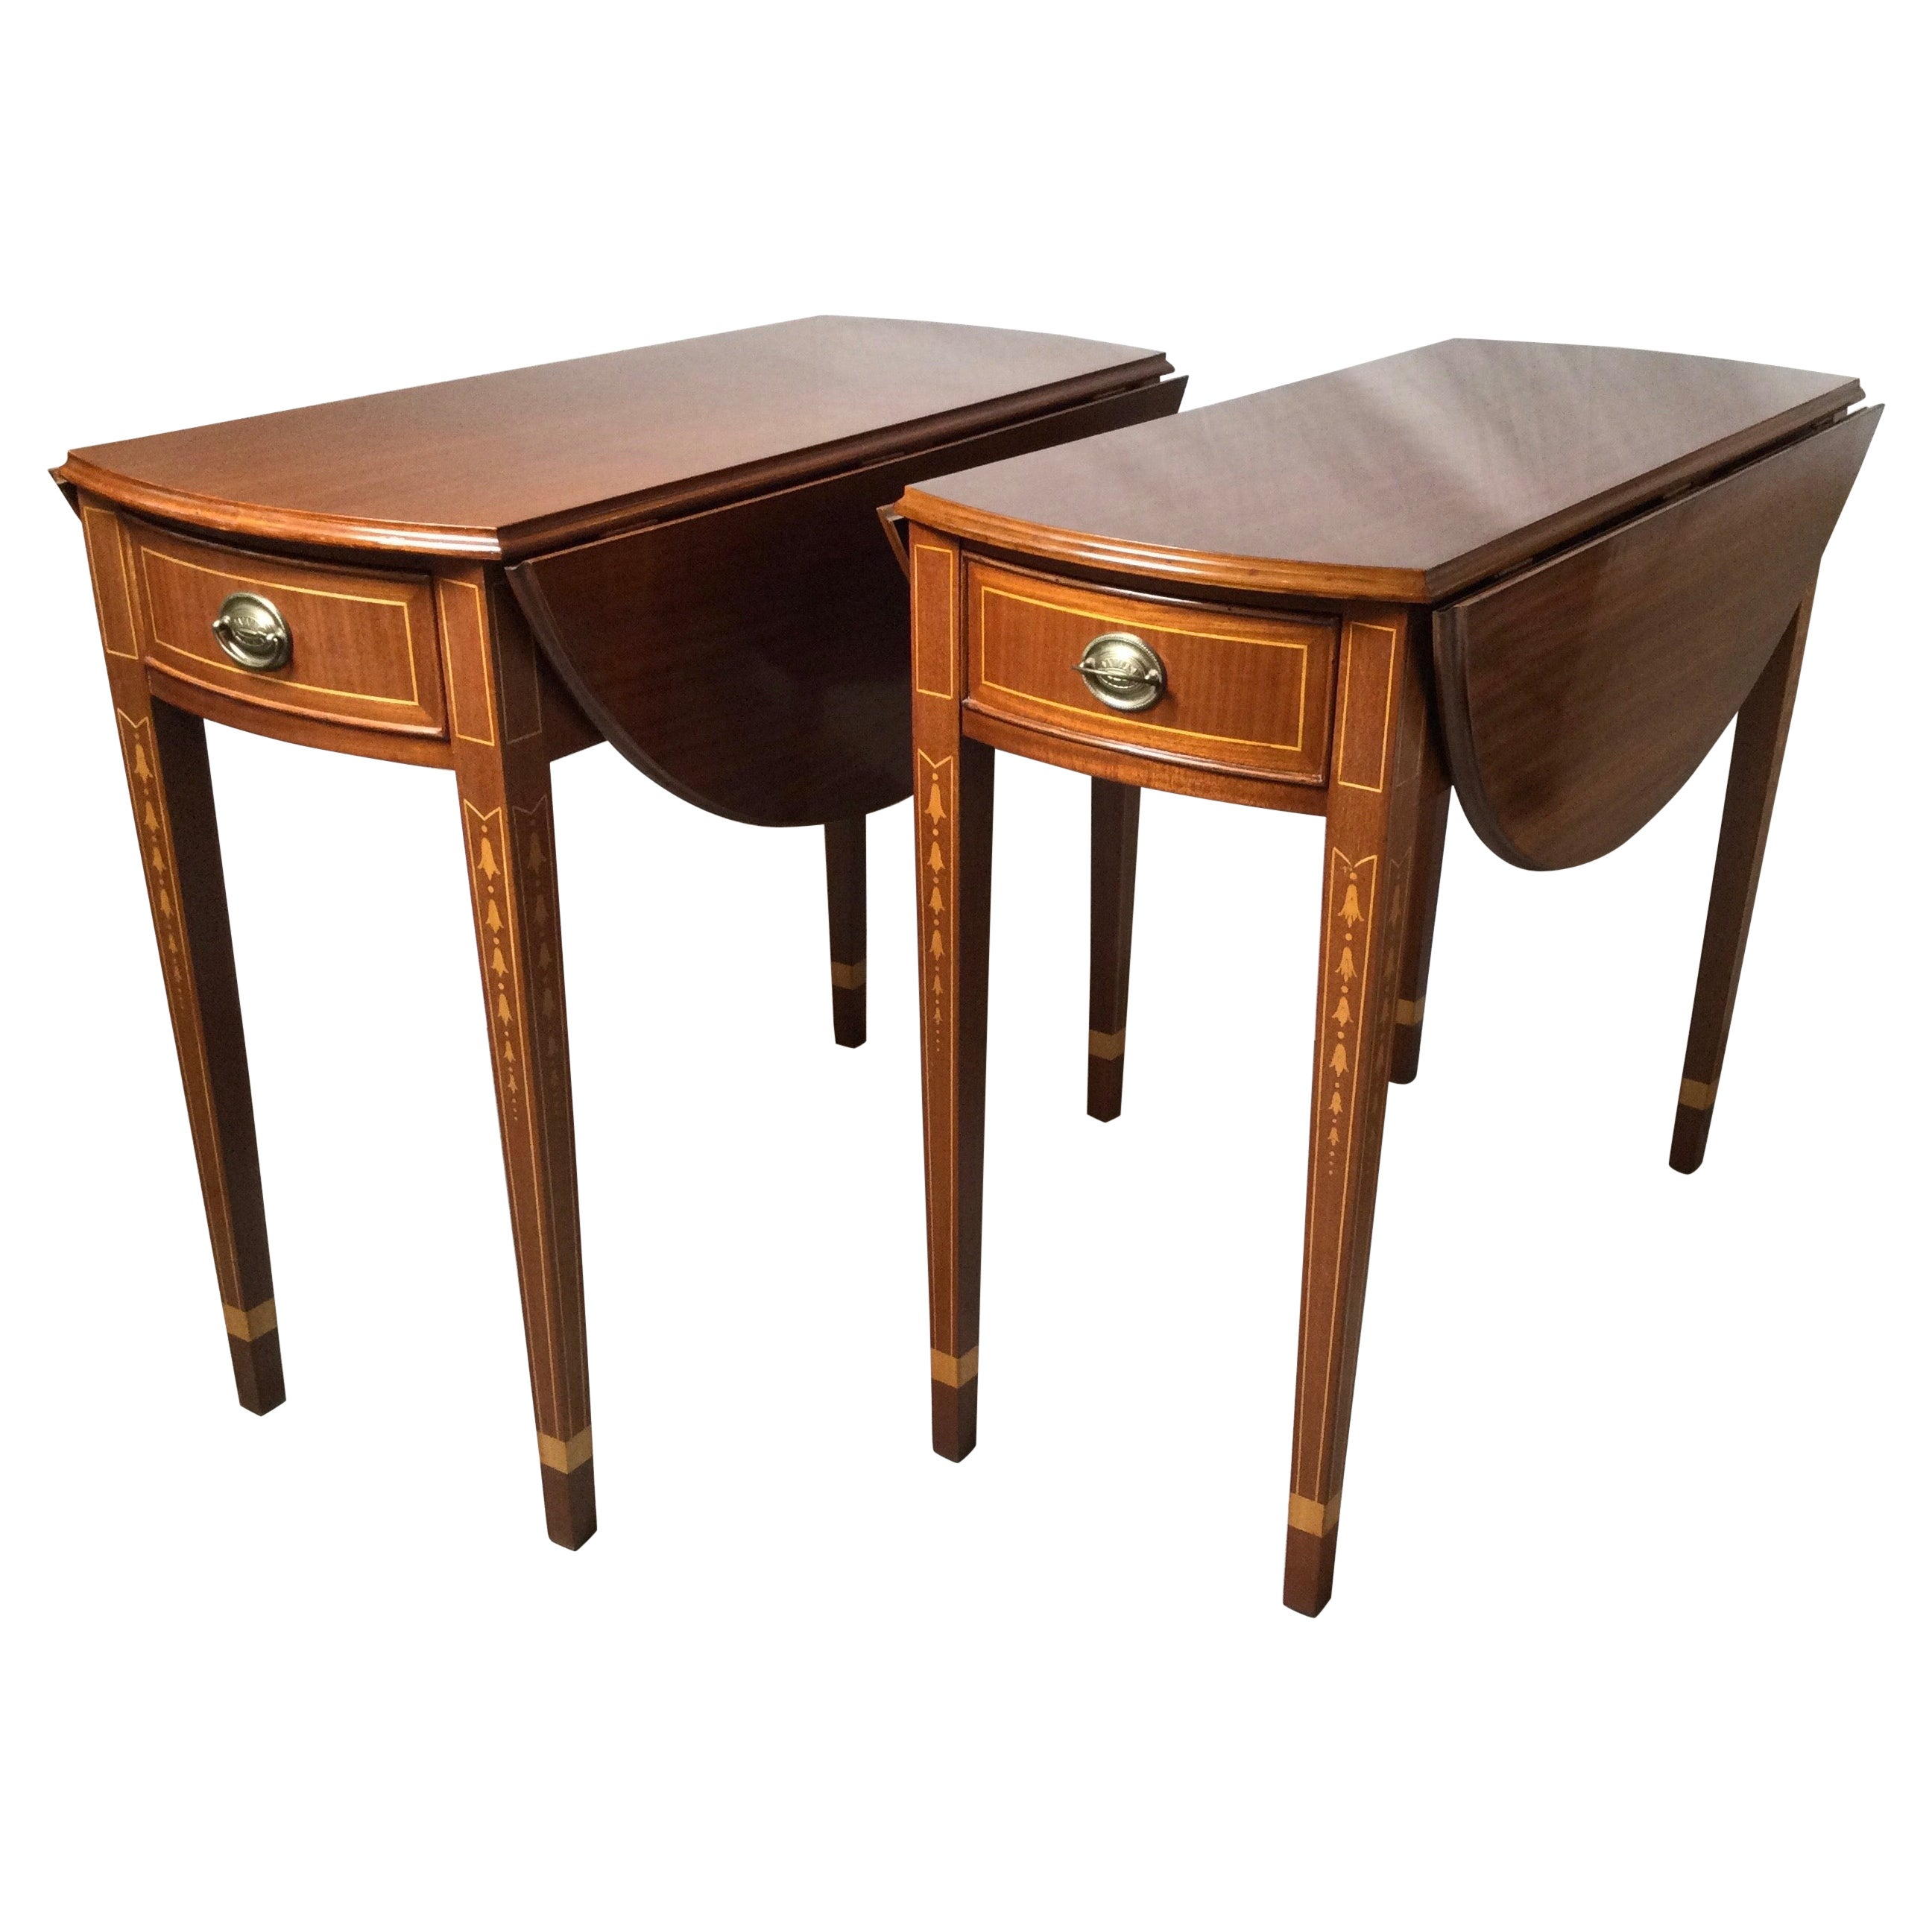 Pair of Mahogany and Satinwood Inlaid Pembroke Tables